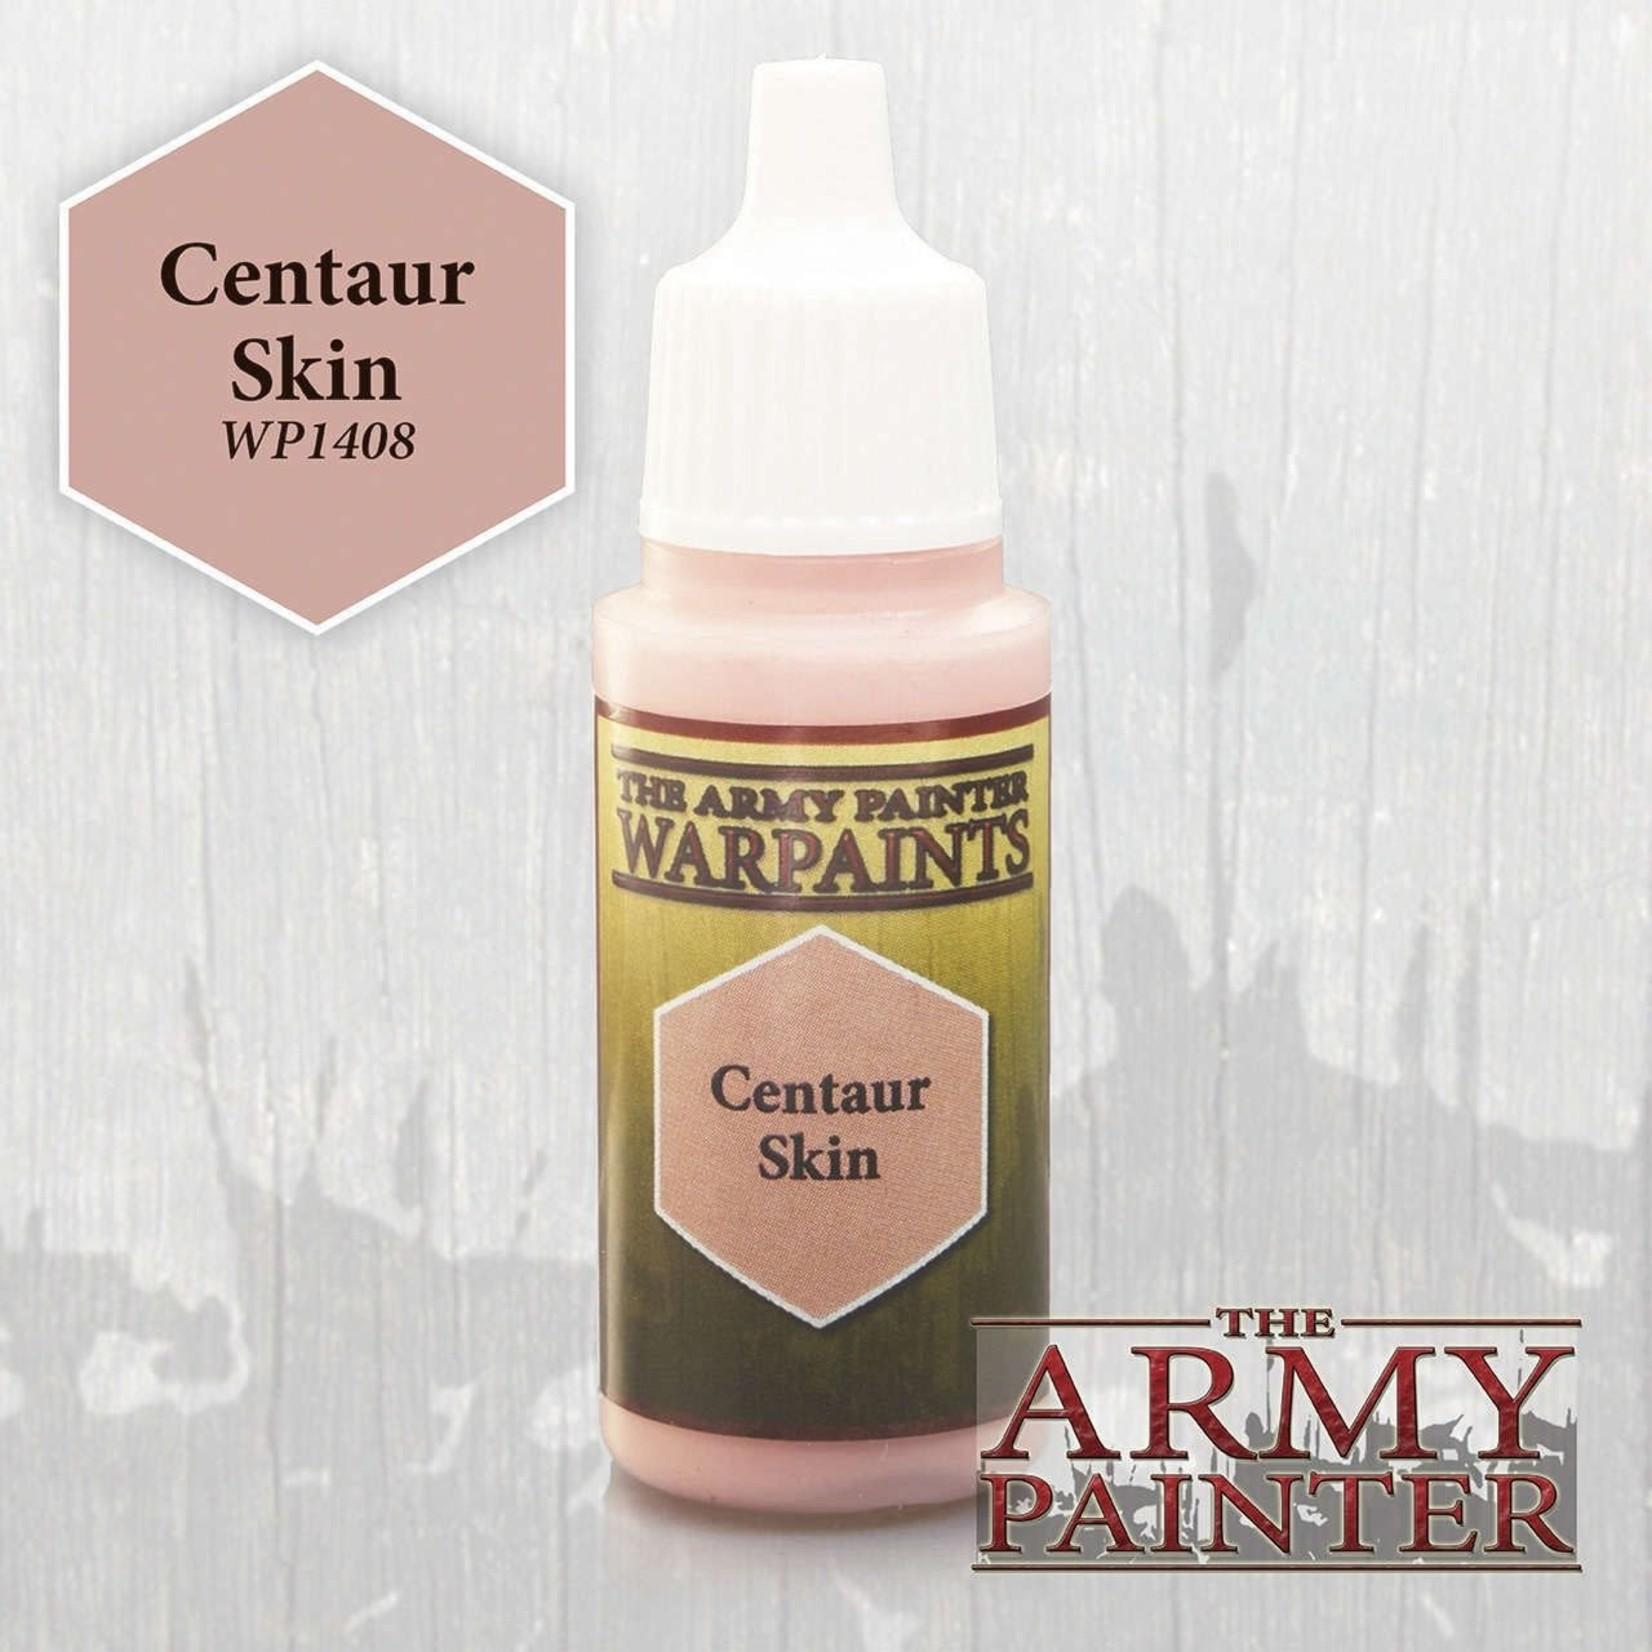 Army Painter APWP Centaur Skin 18ml